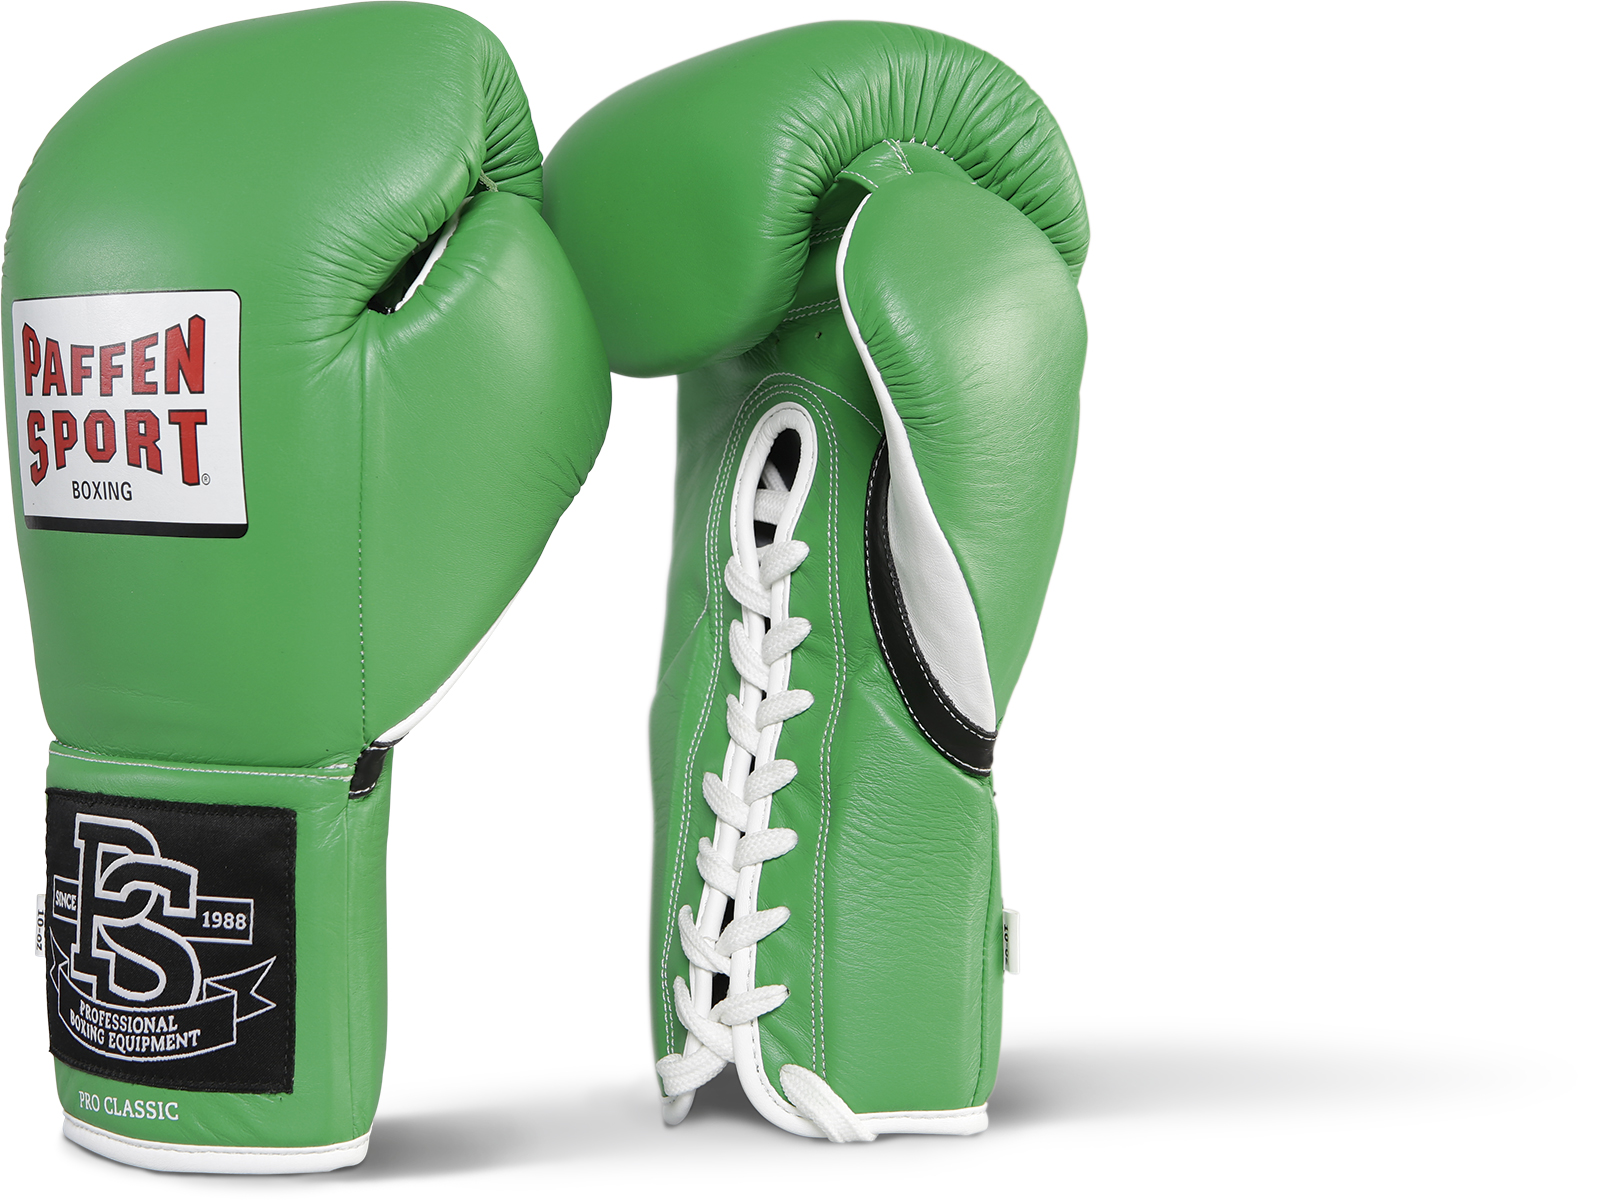 Paffen Sport Pro Classic Bokshandschoenen - Groen - 10 oz